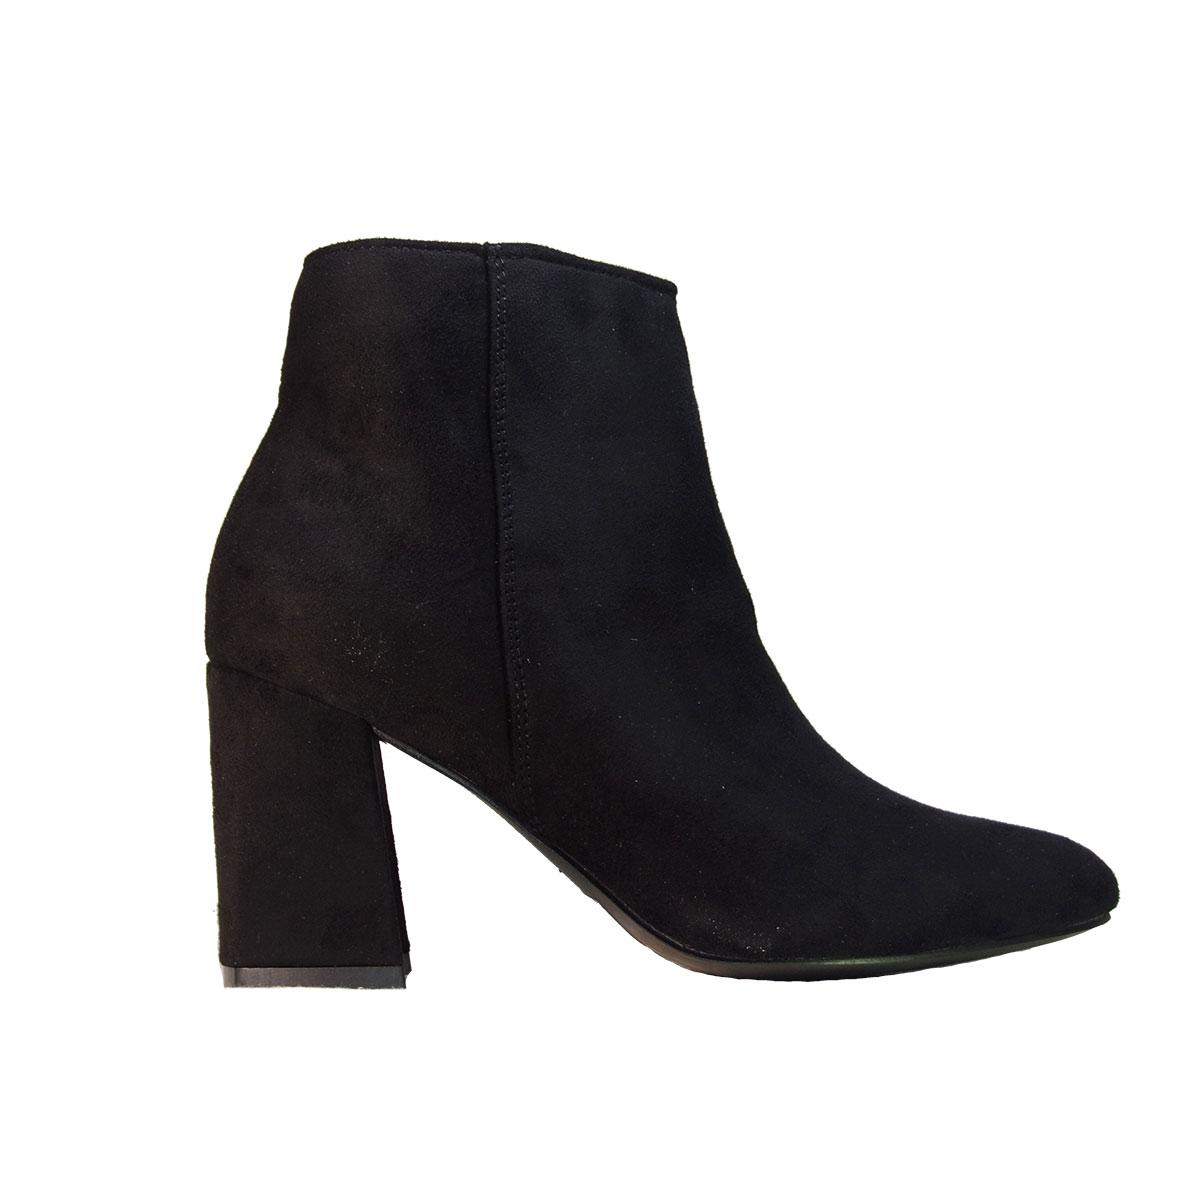 436dc8a4cad ILoveMyShoes 3190 Γυναικεία Μποτάκια Χοντρό Τακούνι Suede Μαύρο ...